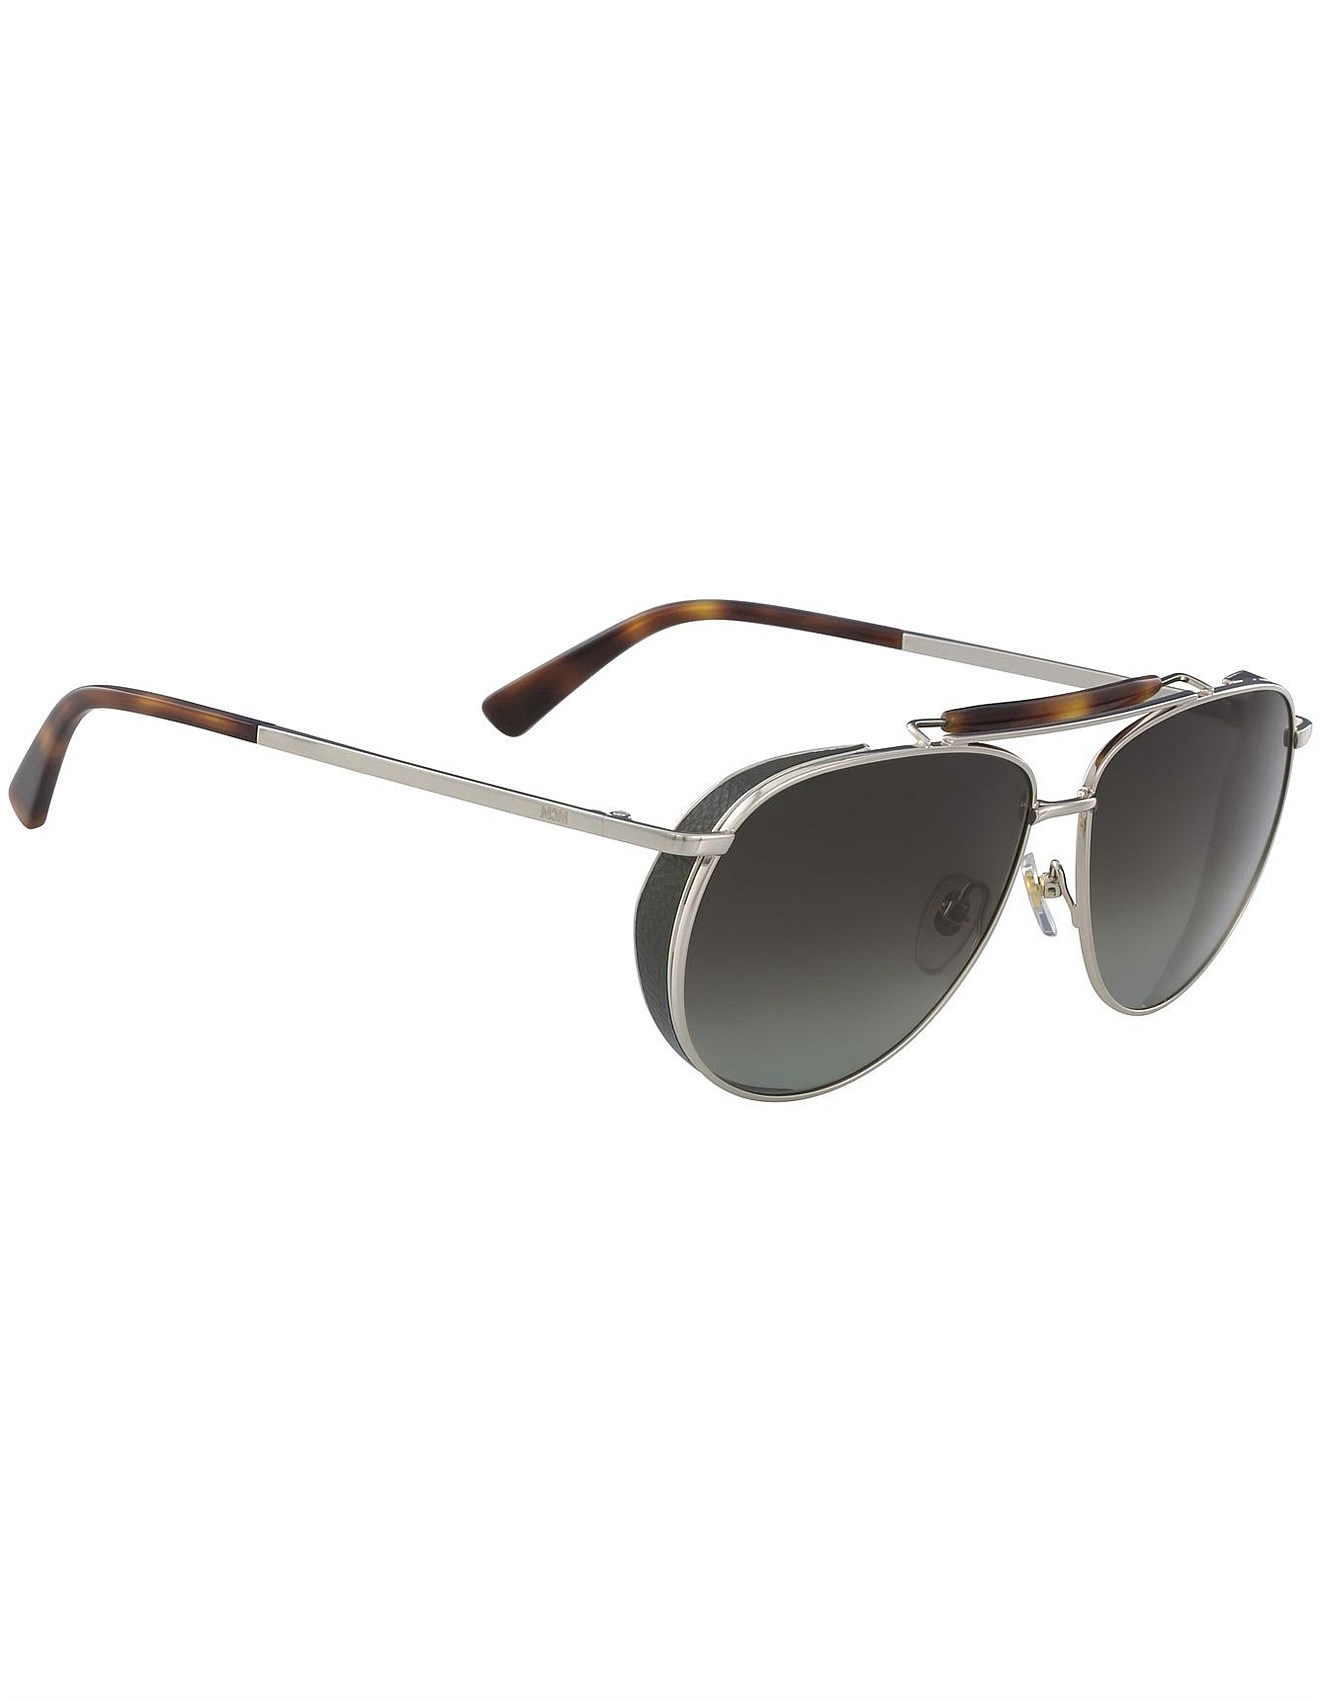 b3b6477113eb Men's Aviator Sunglasses   Buy Sunglasses Online   David Jones - MCM ...